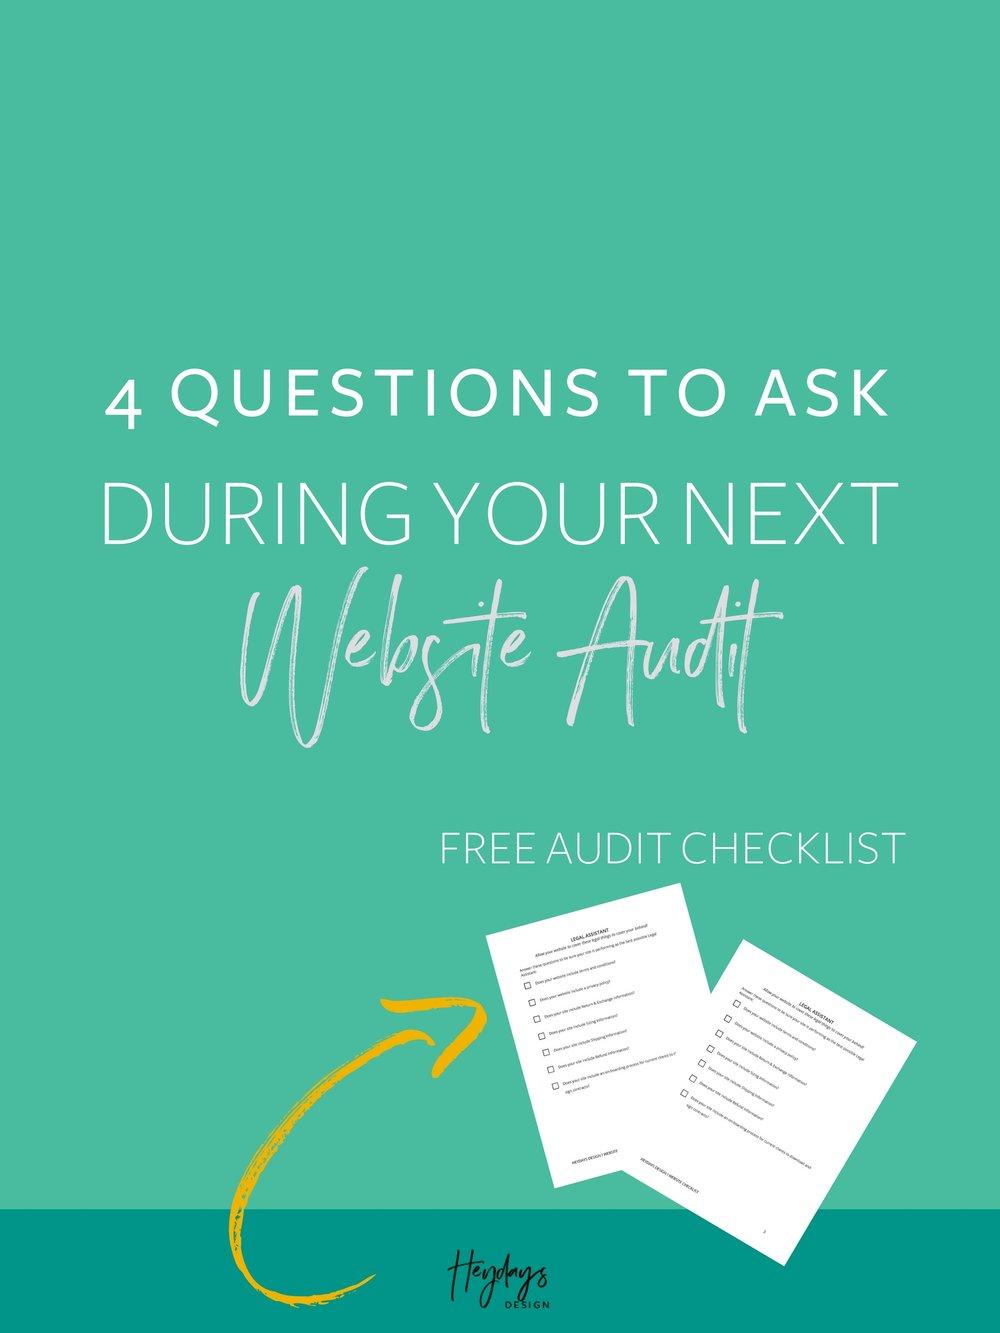 Download a website audit checklist to use when you are auditing your website l Website Audit Template l Heydays Design